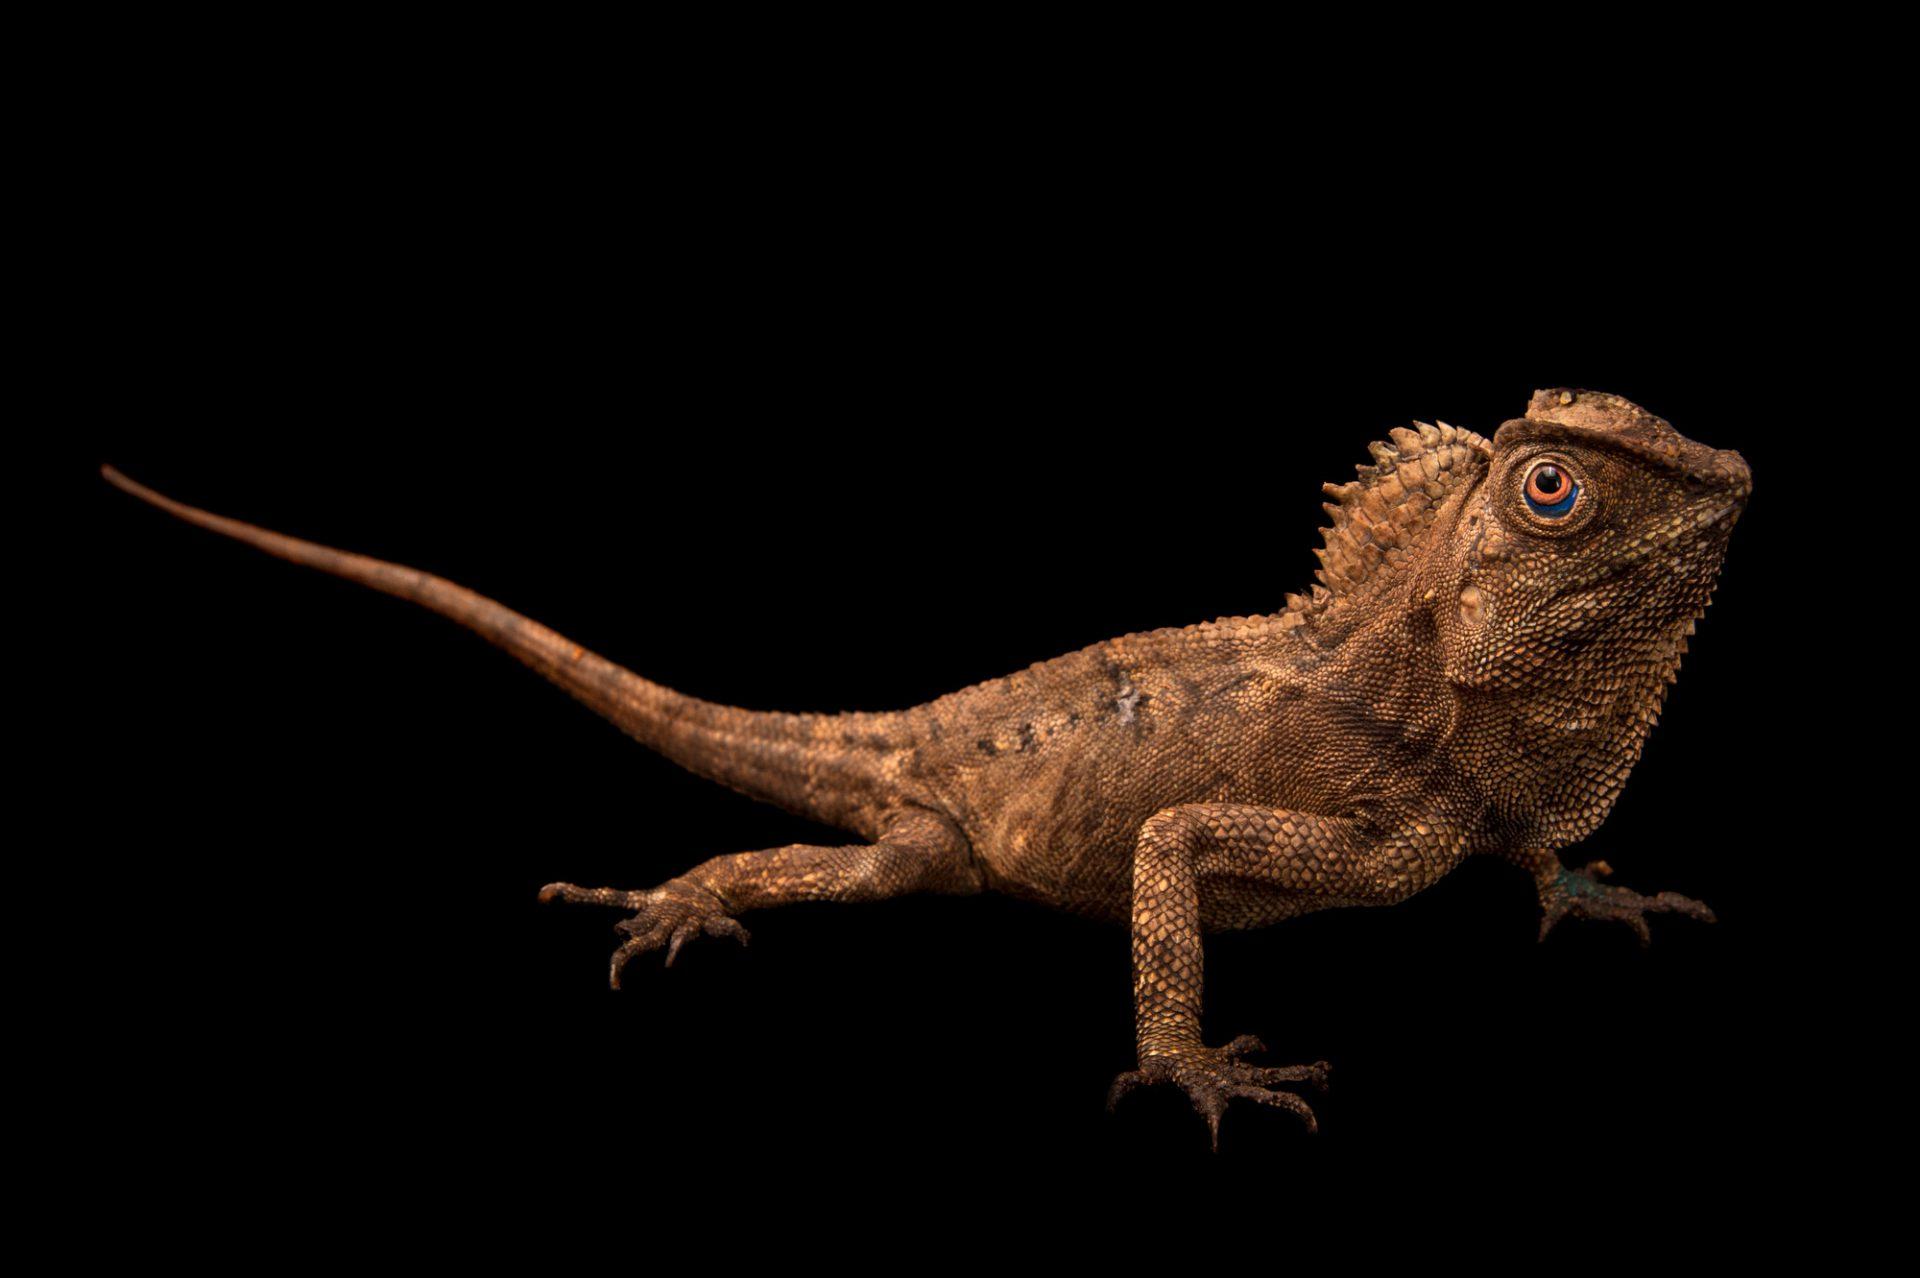 A javan hump-headed lizard or chameleon forest dragon (Gonocephalus chamaeleontinus) at Rolling Hills Wildlife Adventure near Salina, Kansas.